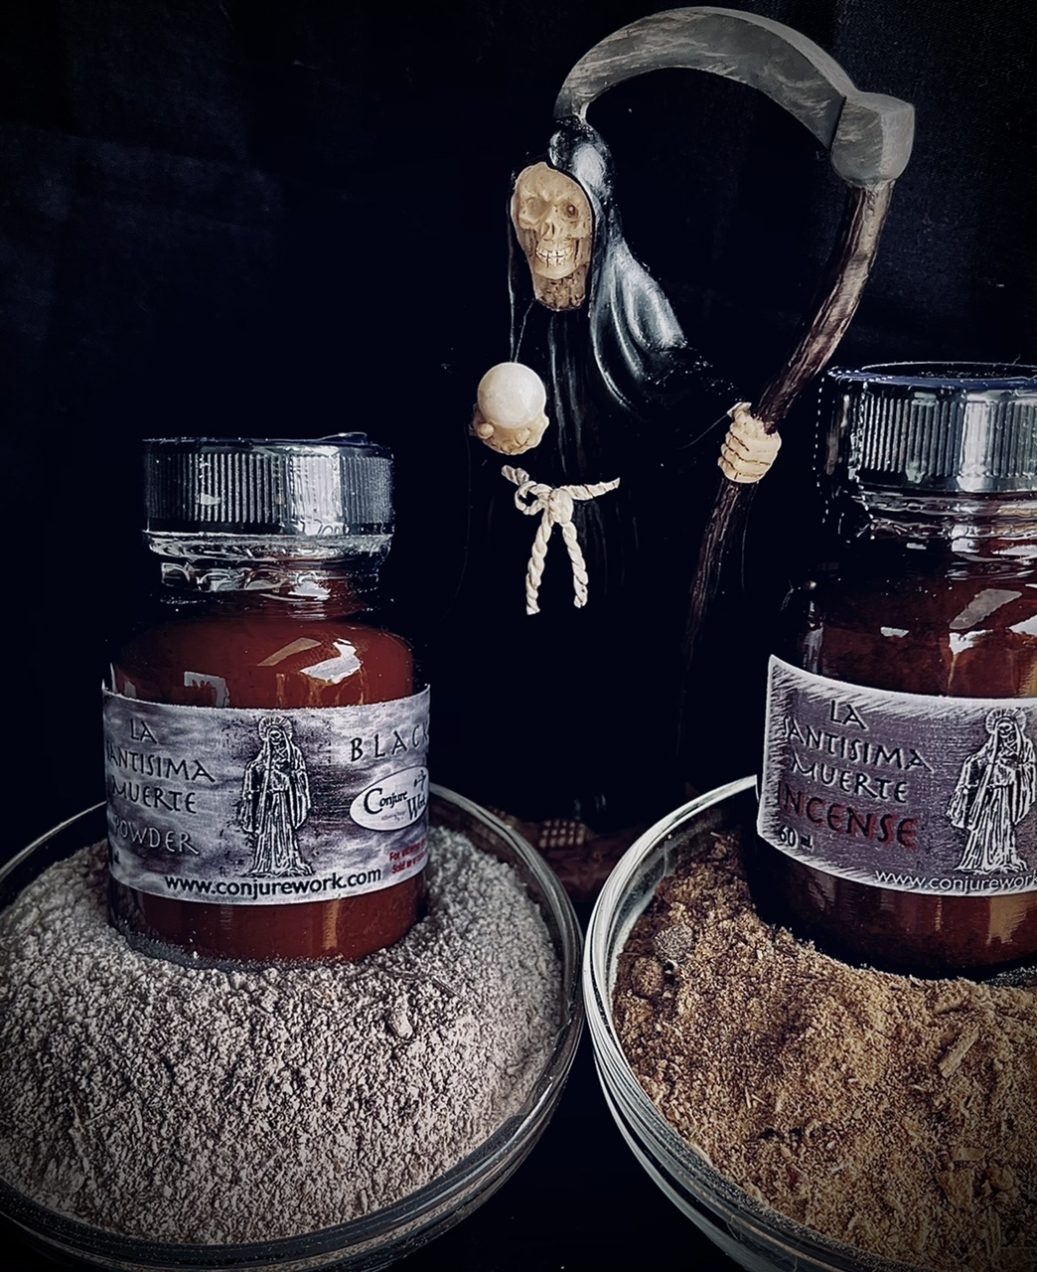 La Santisima Muerte, Black - protection spells, magick, witchcraft, Hoodoo, rootwork, sorcery of Santa Muerte, Her protective, Black Aspect